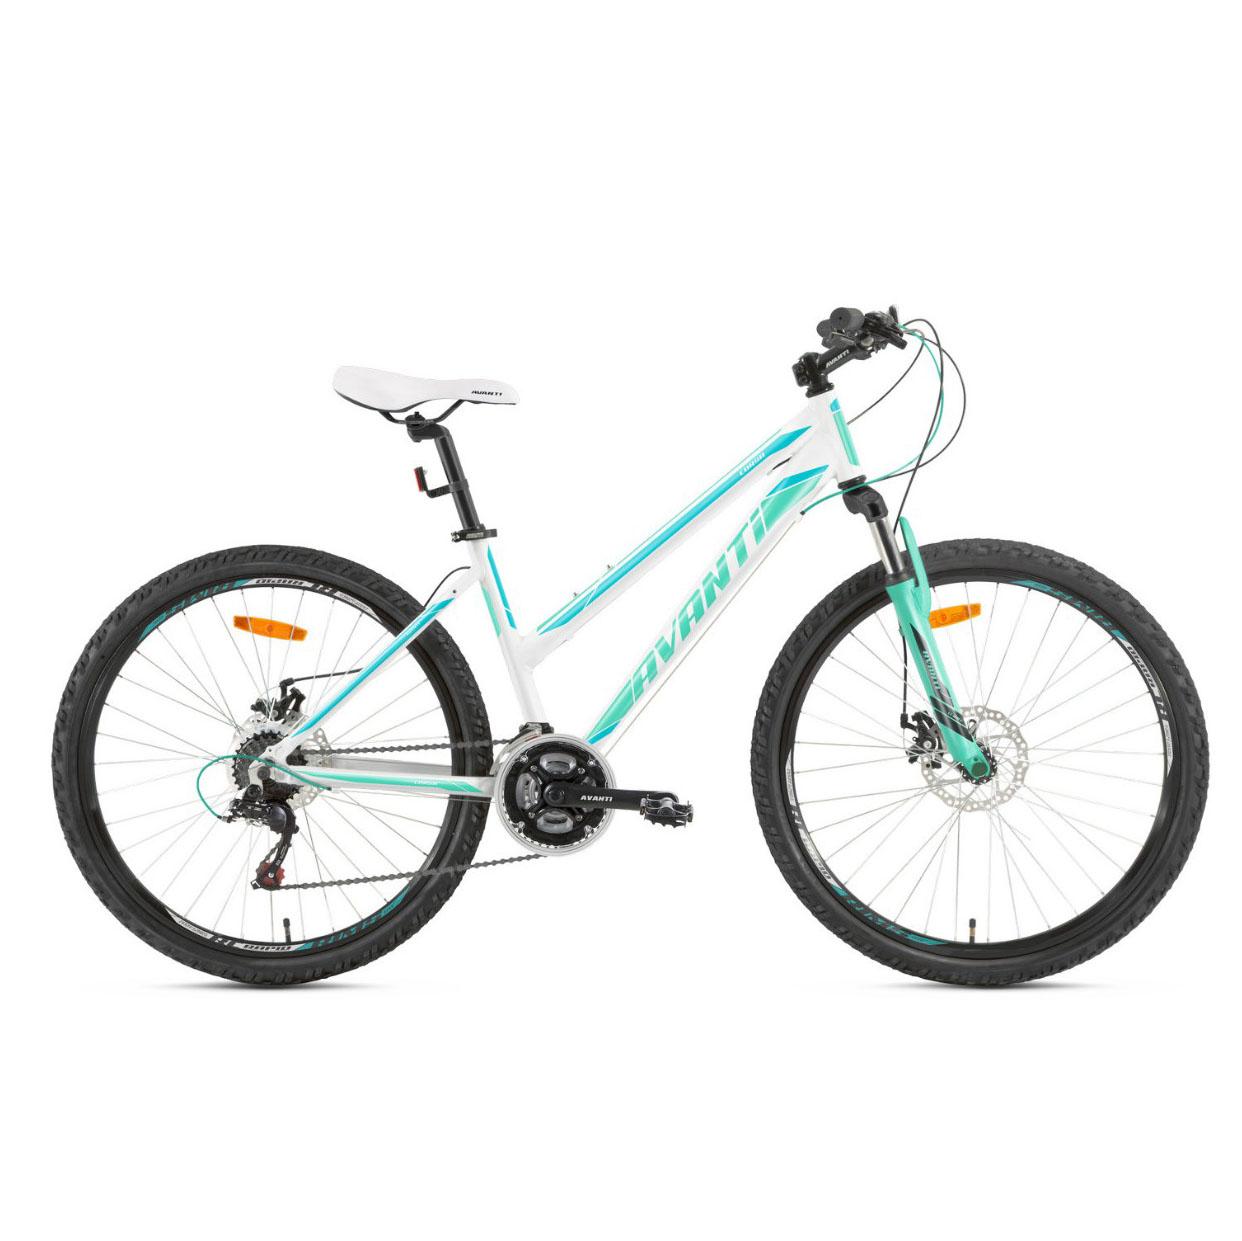 Фото Женский Велосипед  26 Avanti Corsa disk 2018 бело-бирюзовый